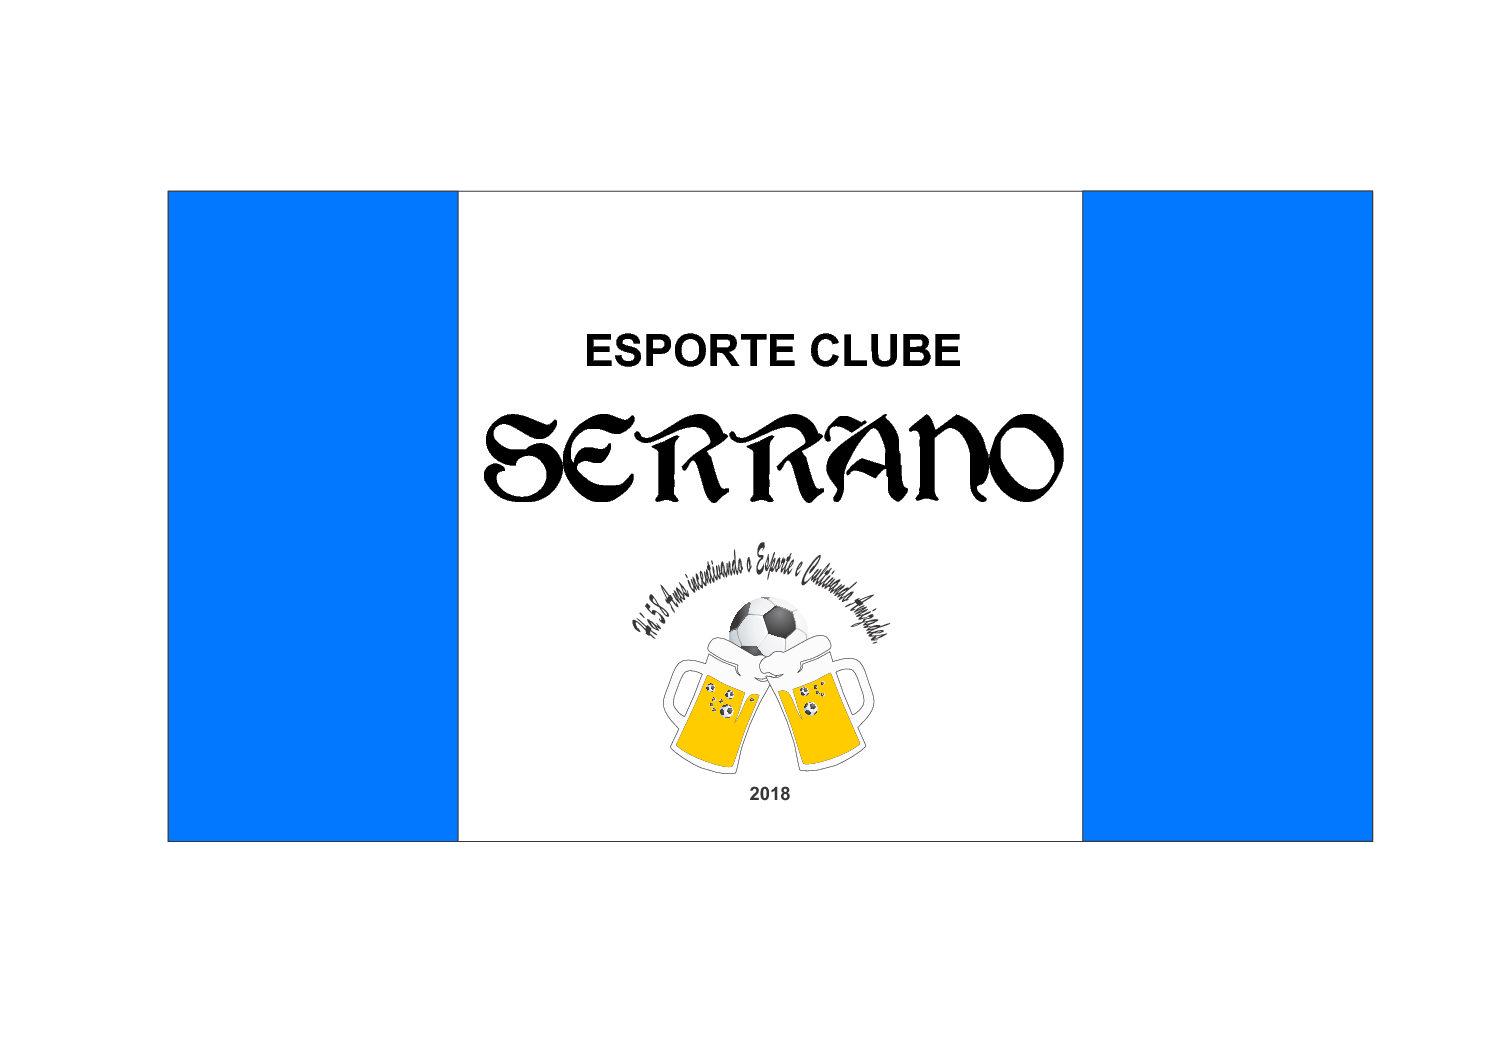 CAMISETAS PERSONALIZADAS PARA BAILE DO CHOPP DO ESPORTE CLUBE SERRANO DA COMUNIDADE DE CRISTO REI DE SANTA BÁRBARA DO SUL/RS.